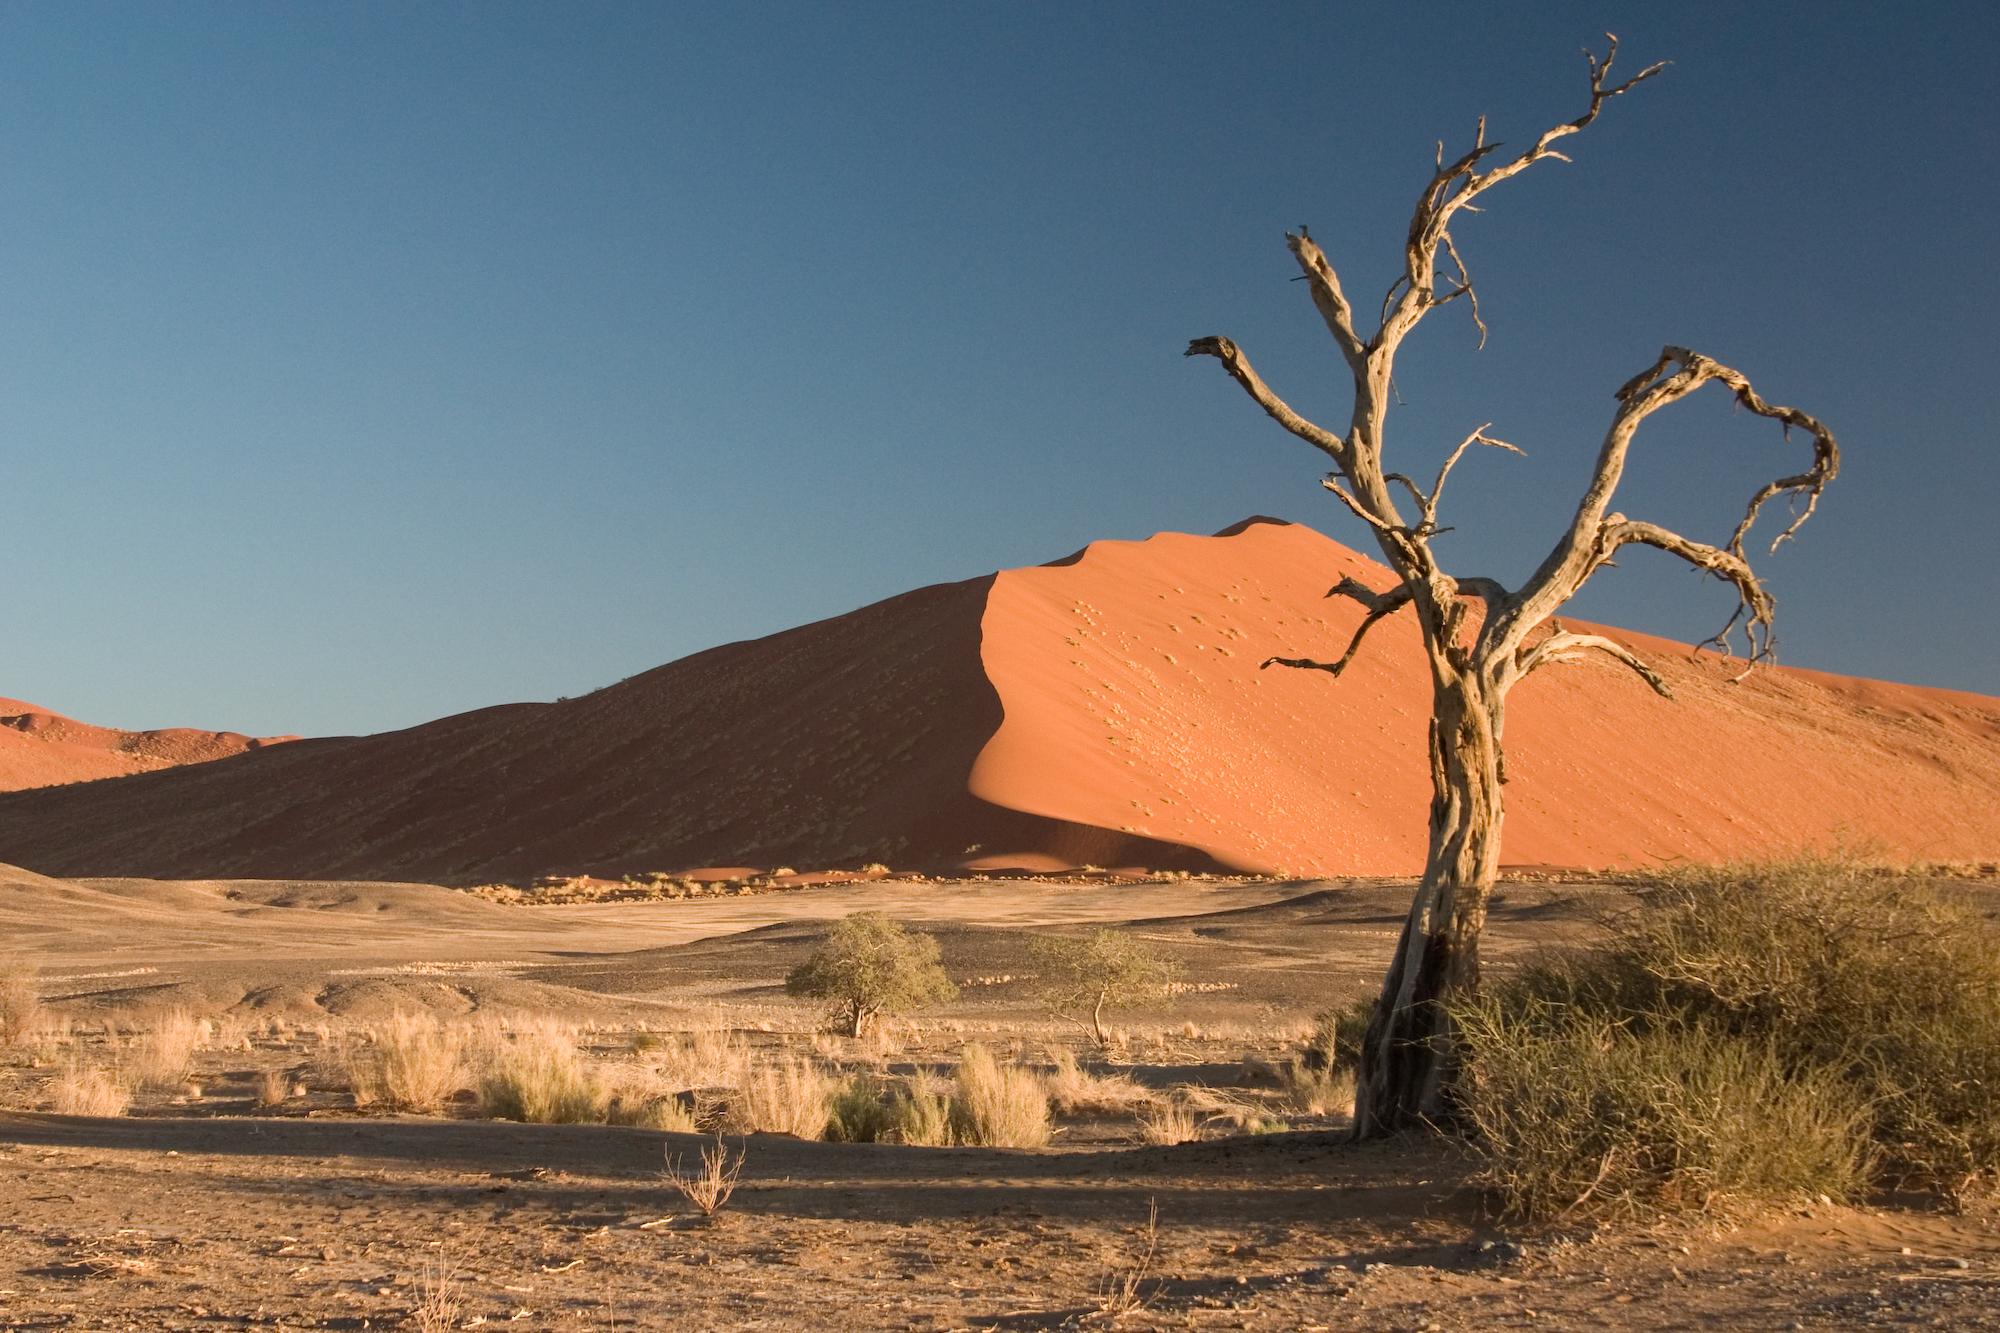 external image Thorn_Tree_Sossusvlei_Namib_Desert_Namibia_Luca_Galuzzi_2004a.JPG